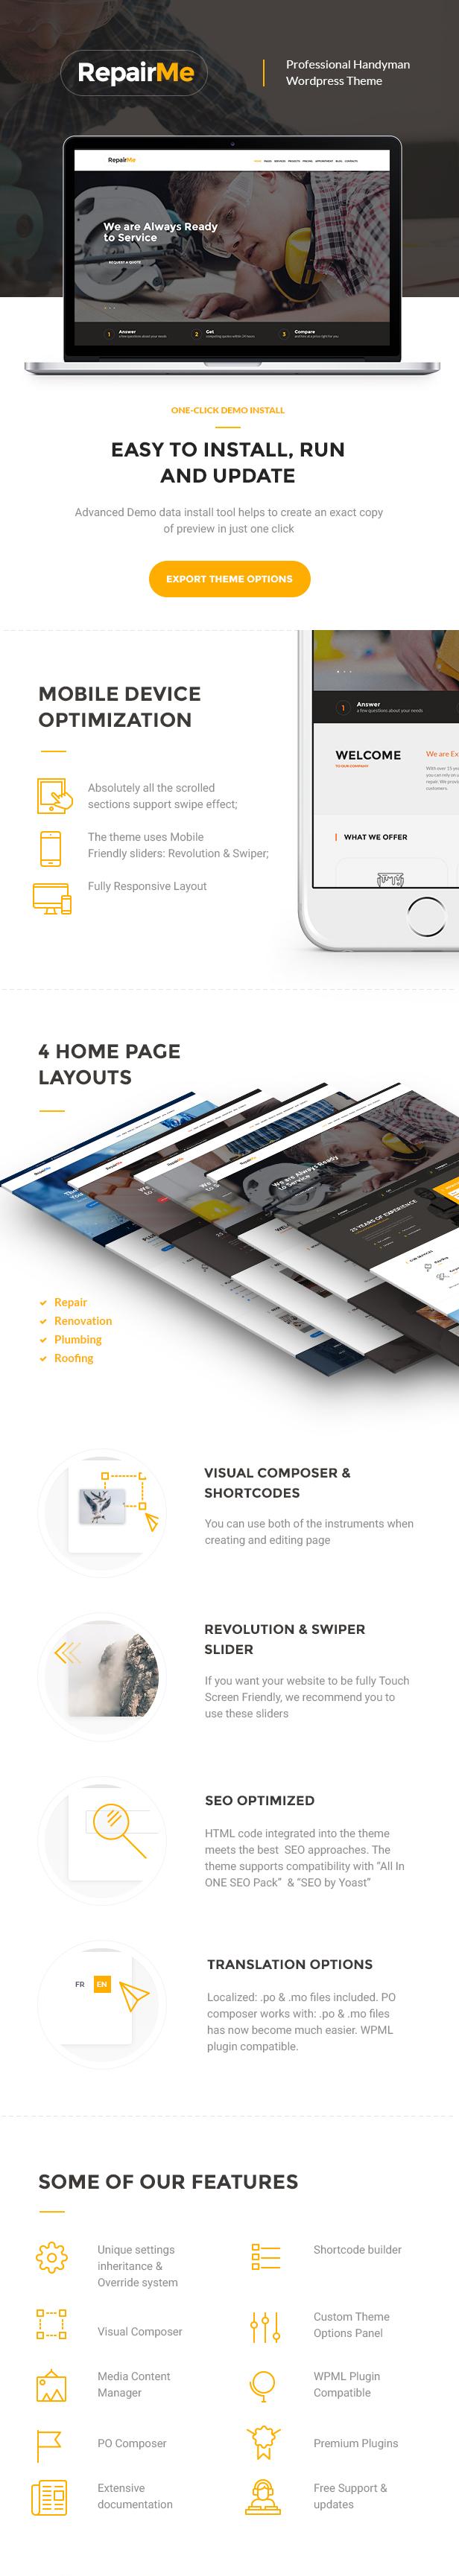 RepairMe - A Vibrant Construction & Renovation WordPress Theme - 2